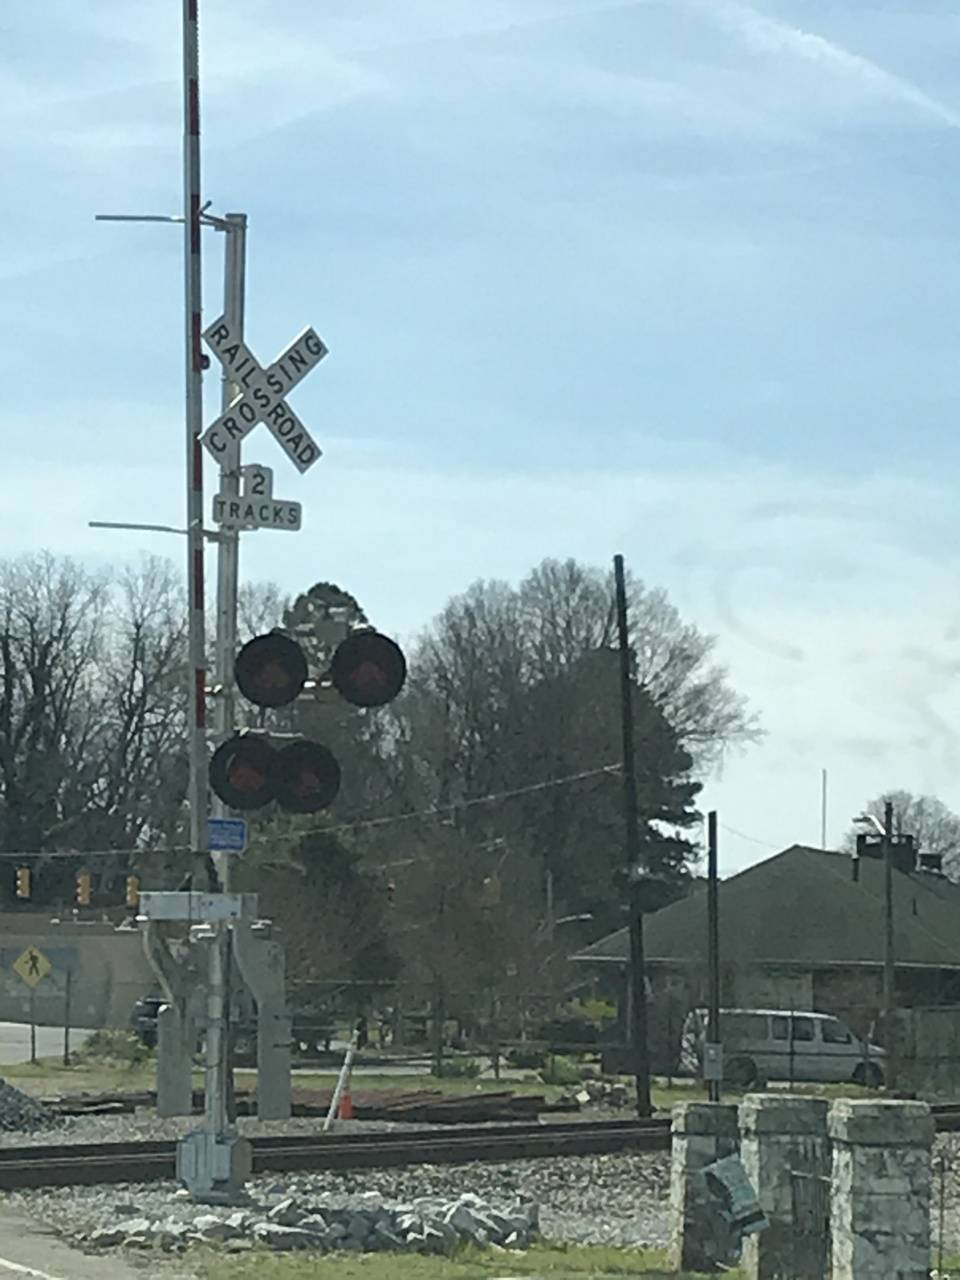 My Railroad Crossing